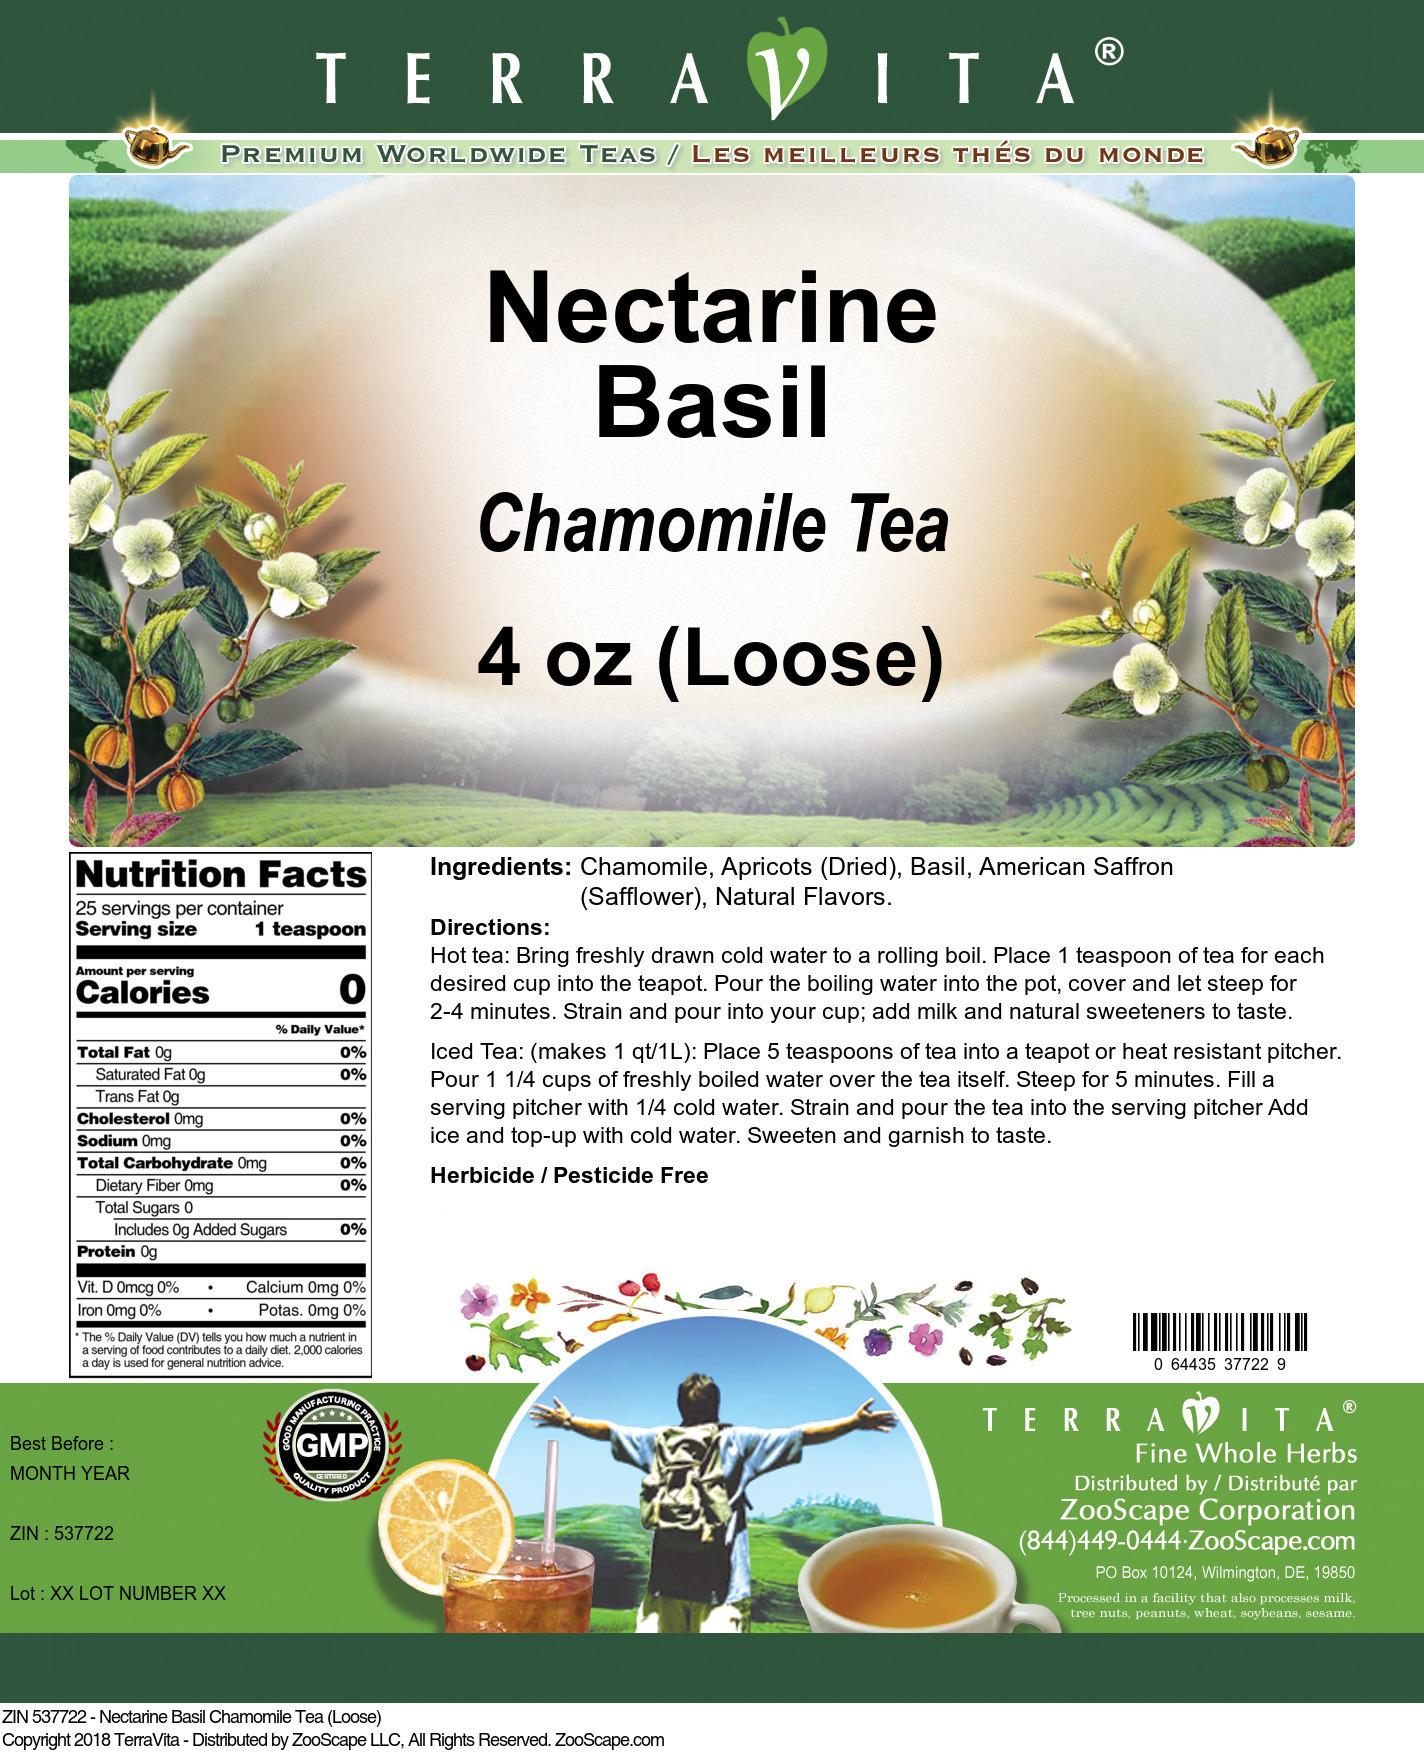 Nectarine Basil Chamomile Tea